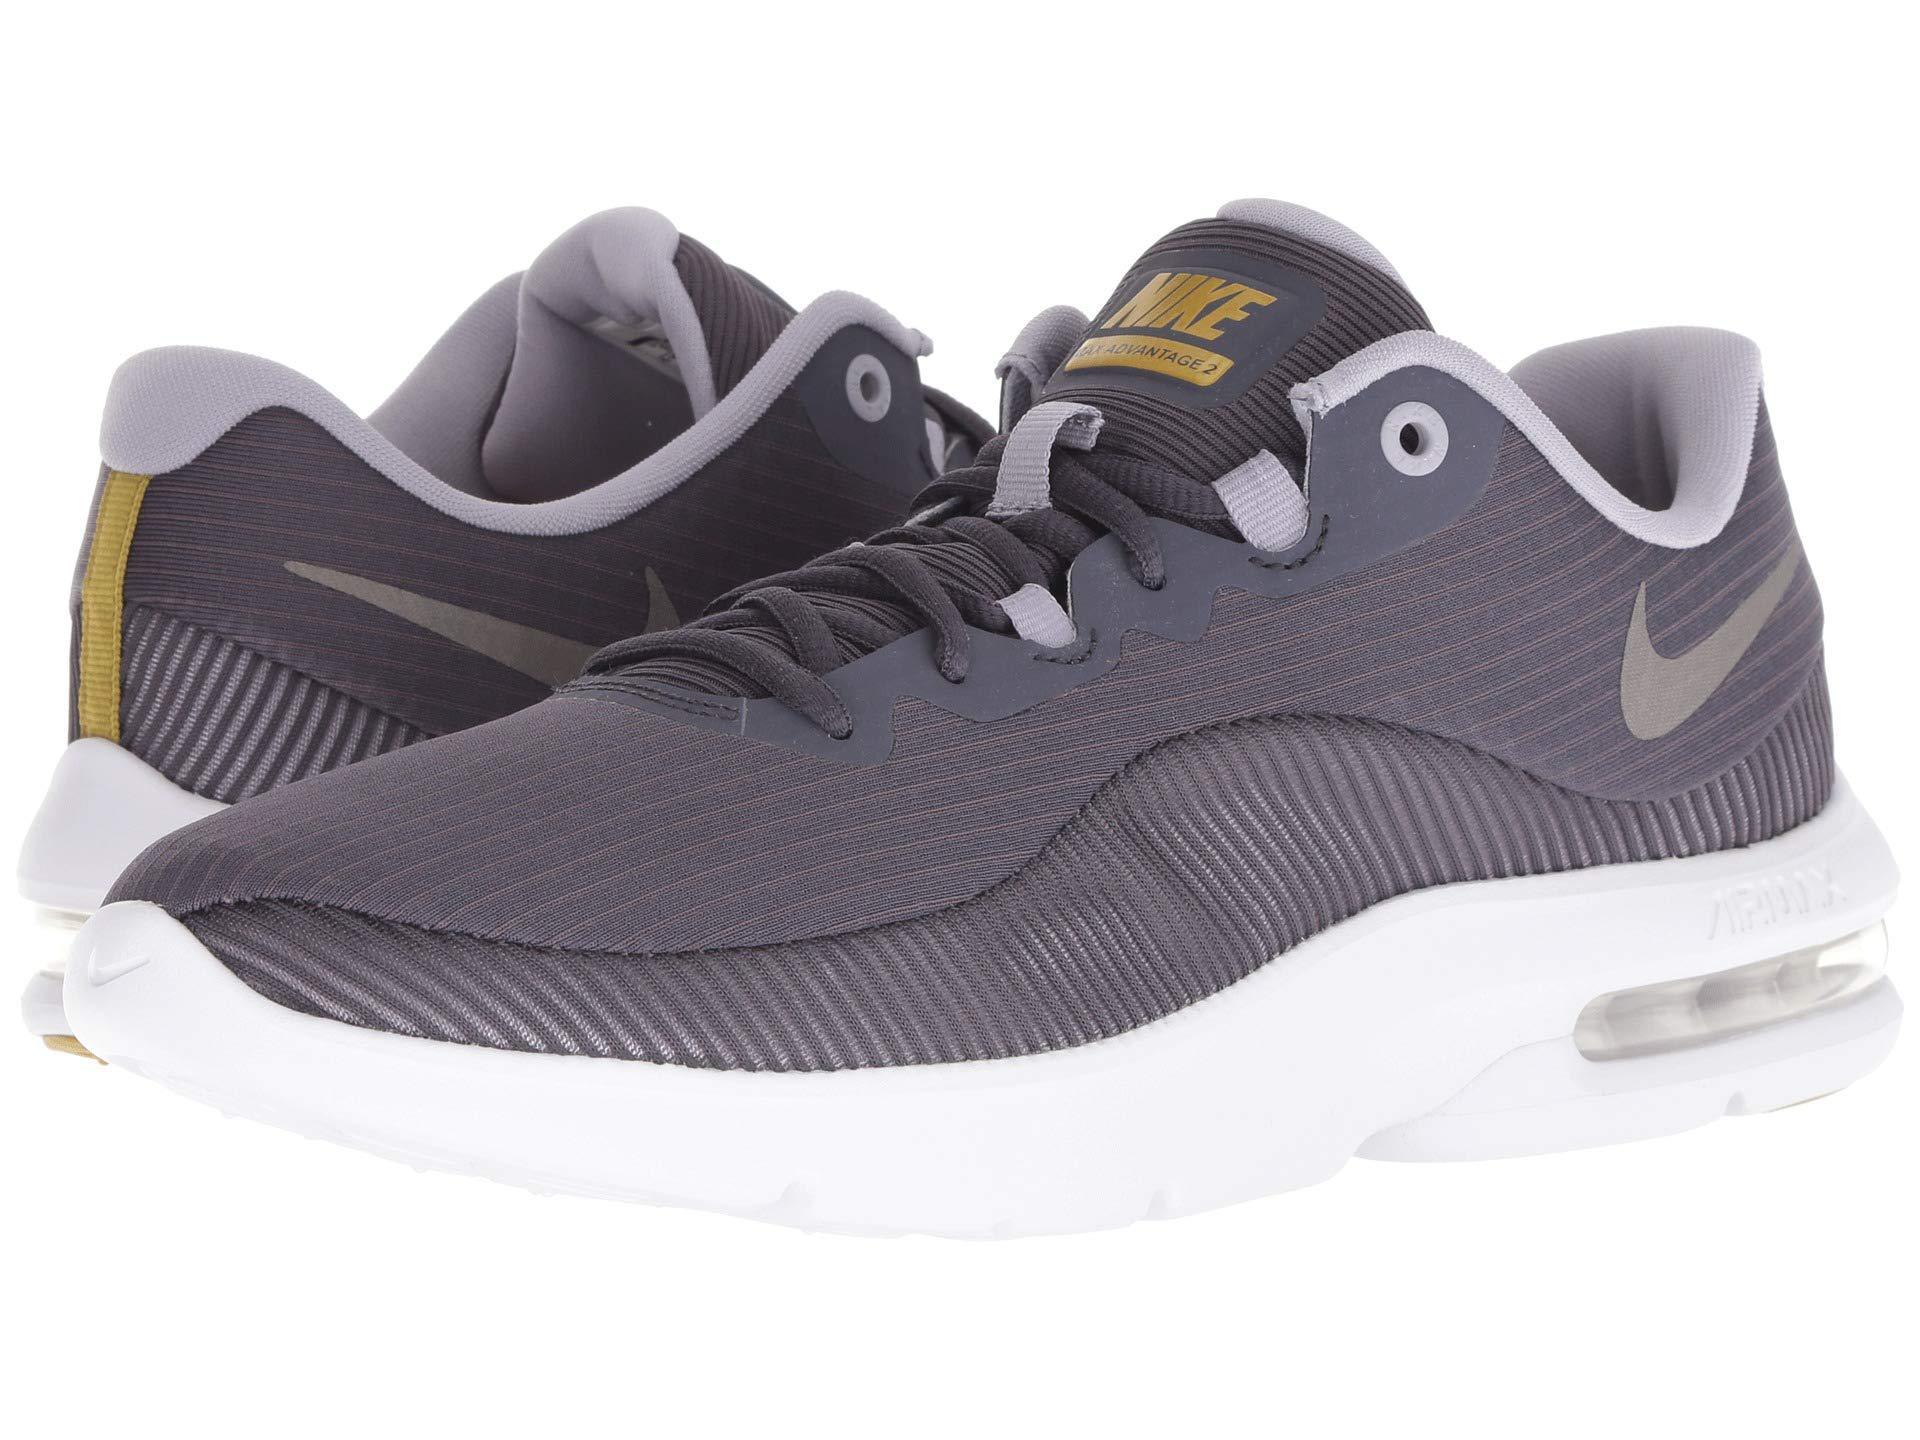 750cb924180 Nike. Air Max Advantage 2 (gridiron metallic Pewter provence Purple) Men s  Running Shoes